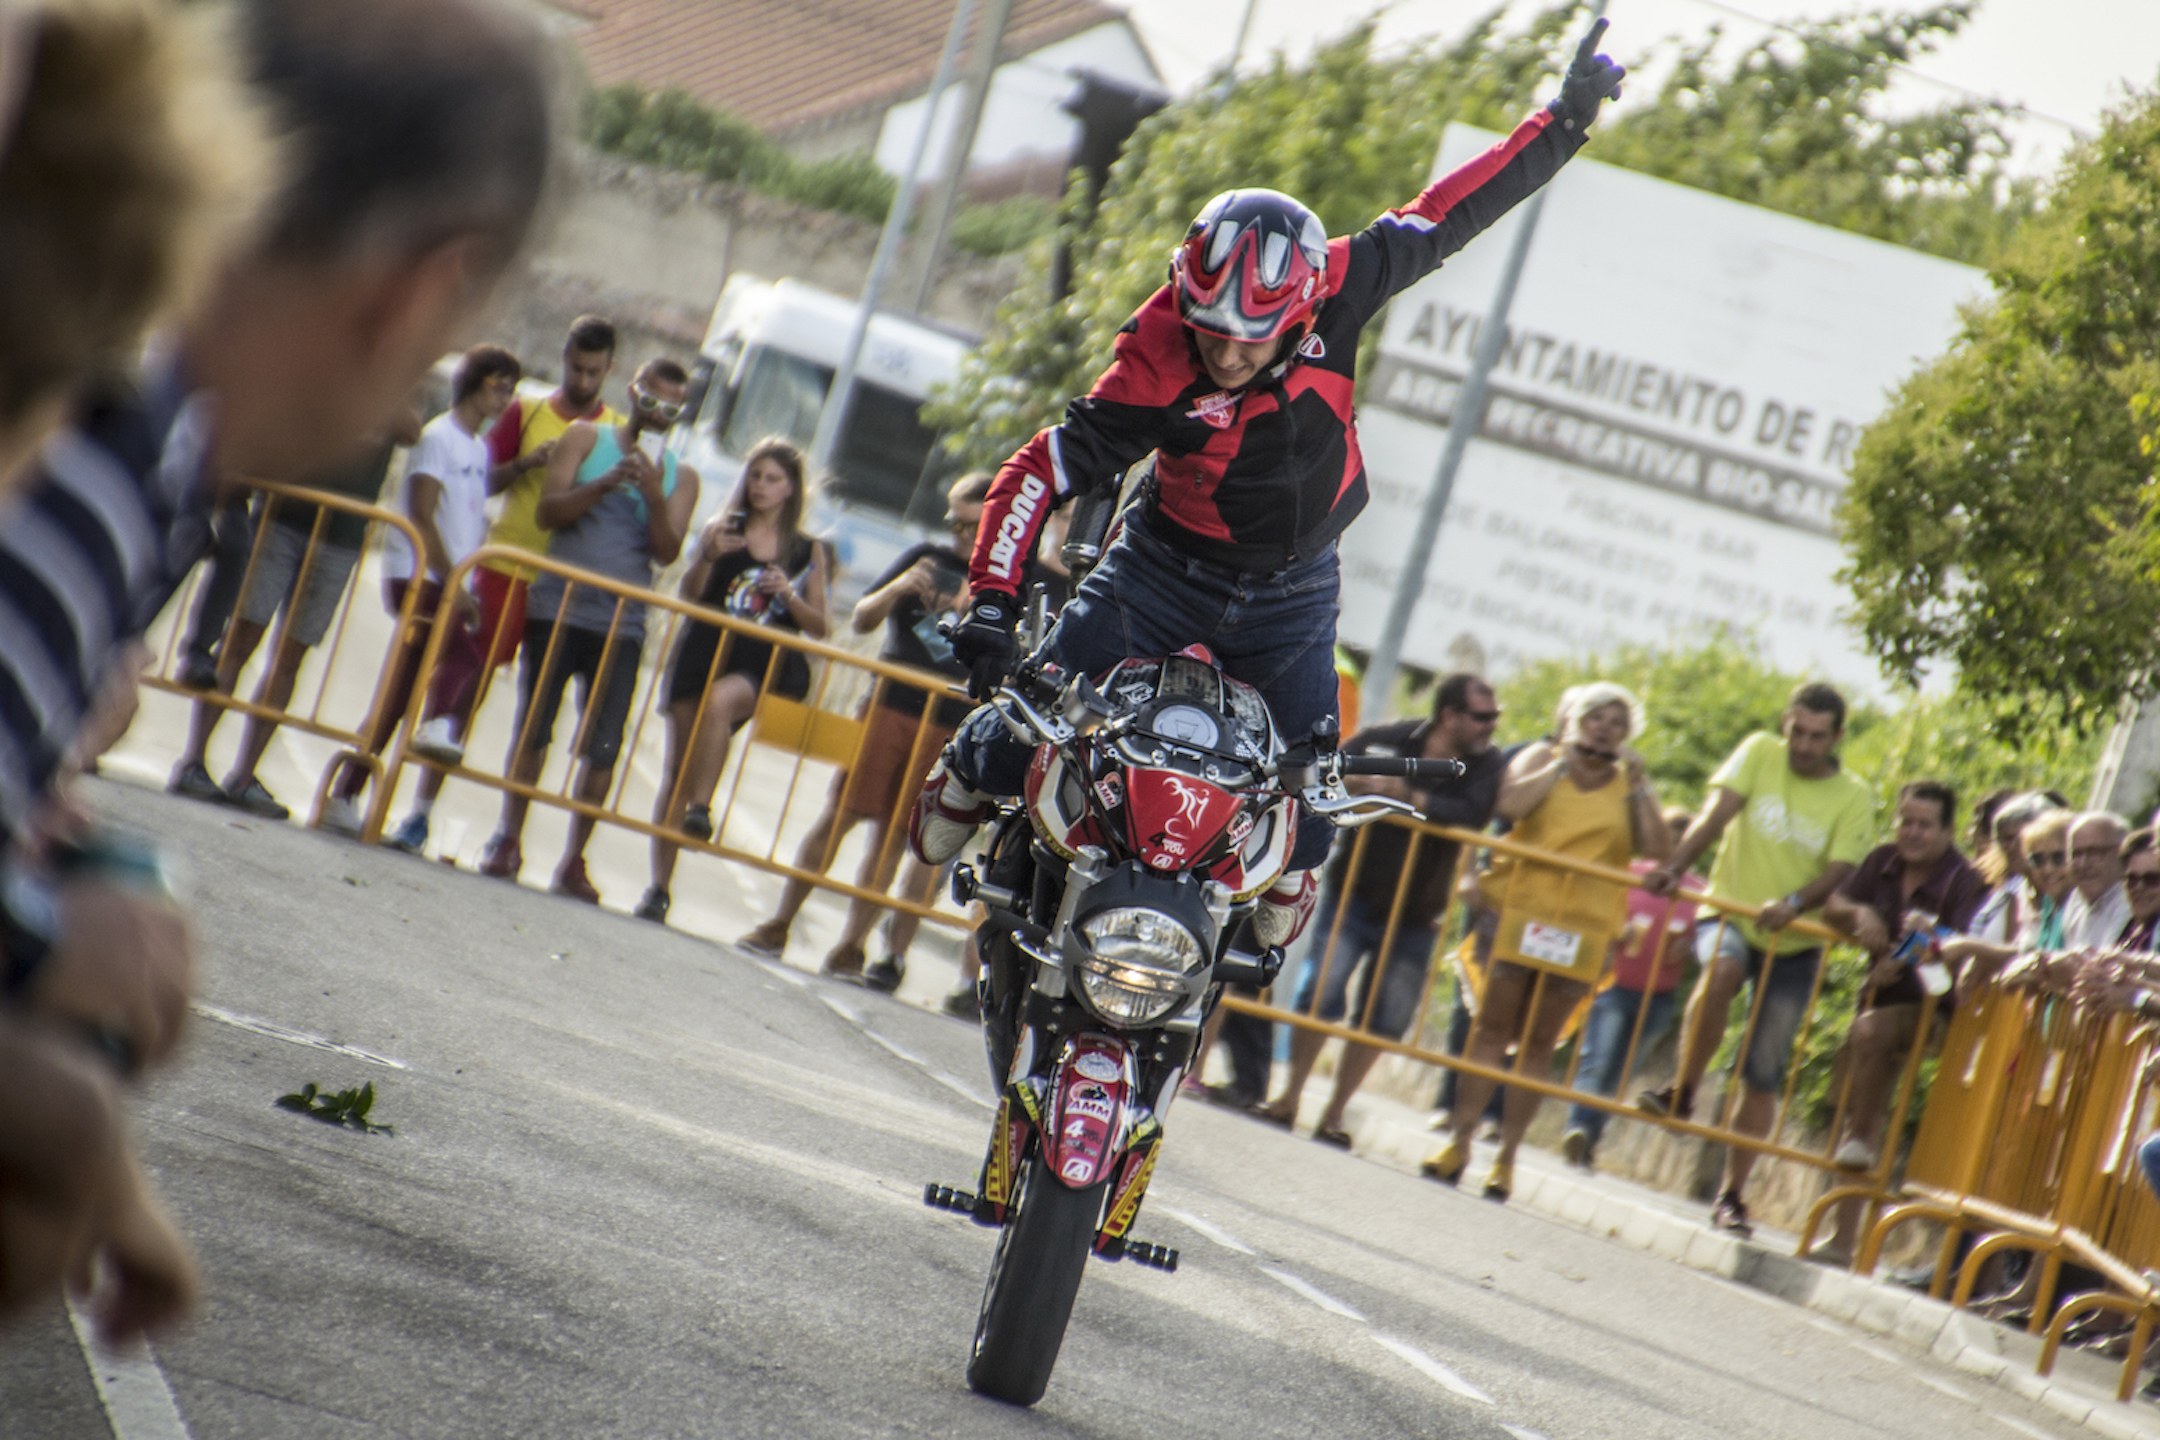 11_ROELOS DE SAYAGO_EMILIO_ZAMORA_DUCATI_STUNT_TEAM_MOTOR_SHOW_ESPECTACULO_MOTO_QUAD_FREESTYLE_COCHE_DRIFT_MINIBIKE_LEGEND_CAR_XDIAVEL_MONSTER_SUPERSPORT_FELIPE_HERNANDEZ_2017